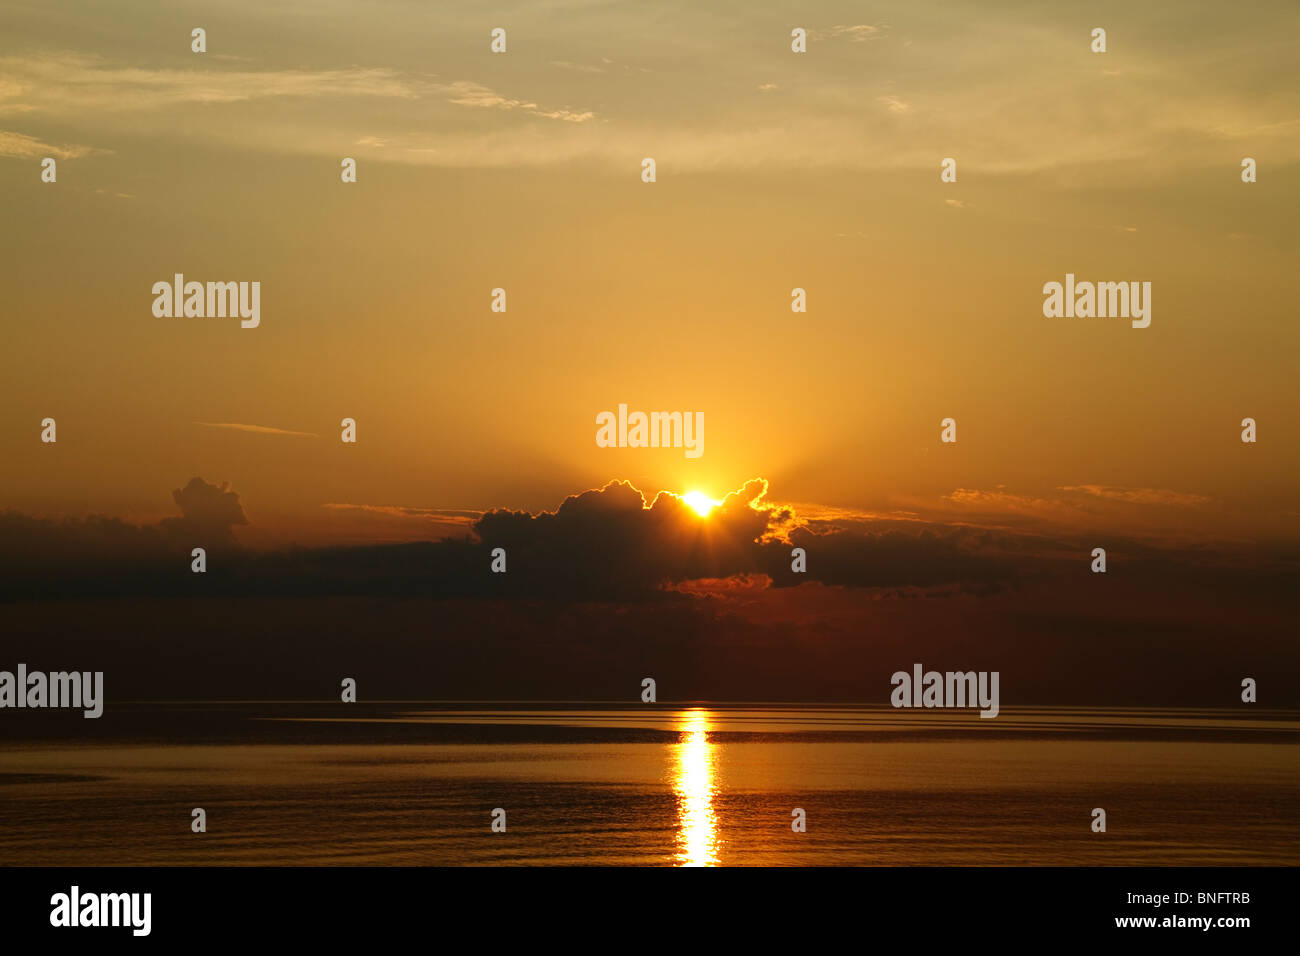 sunset at Sea - Stock Image